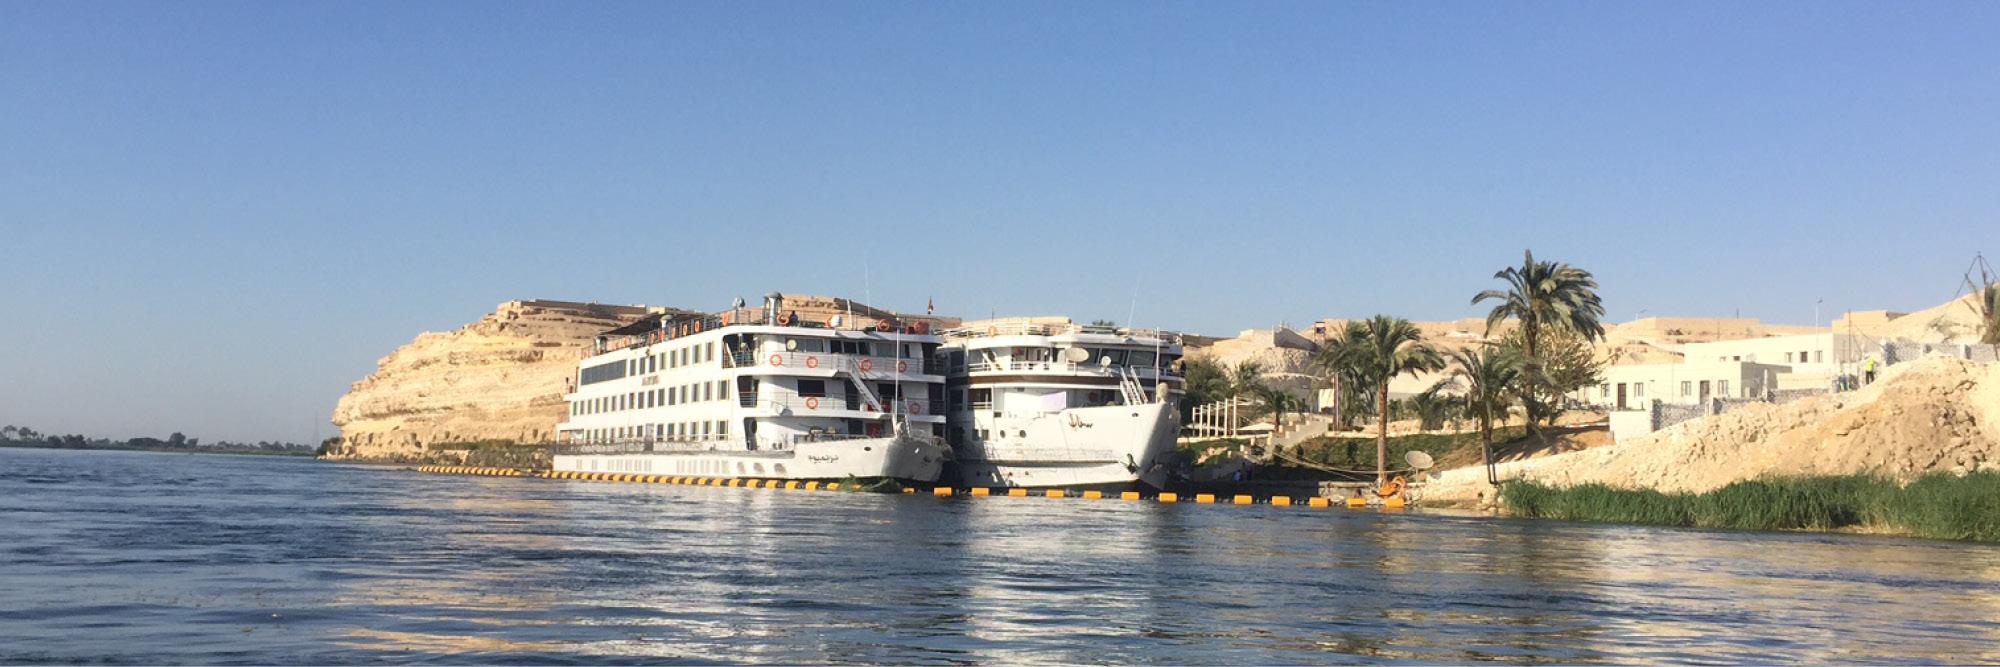 Bolina Port Security Booms